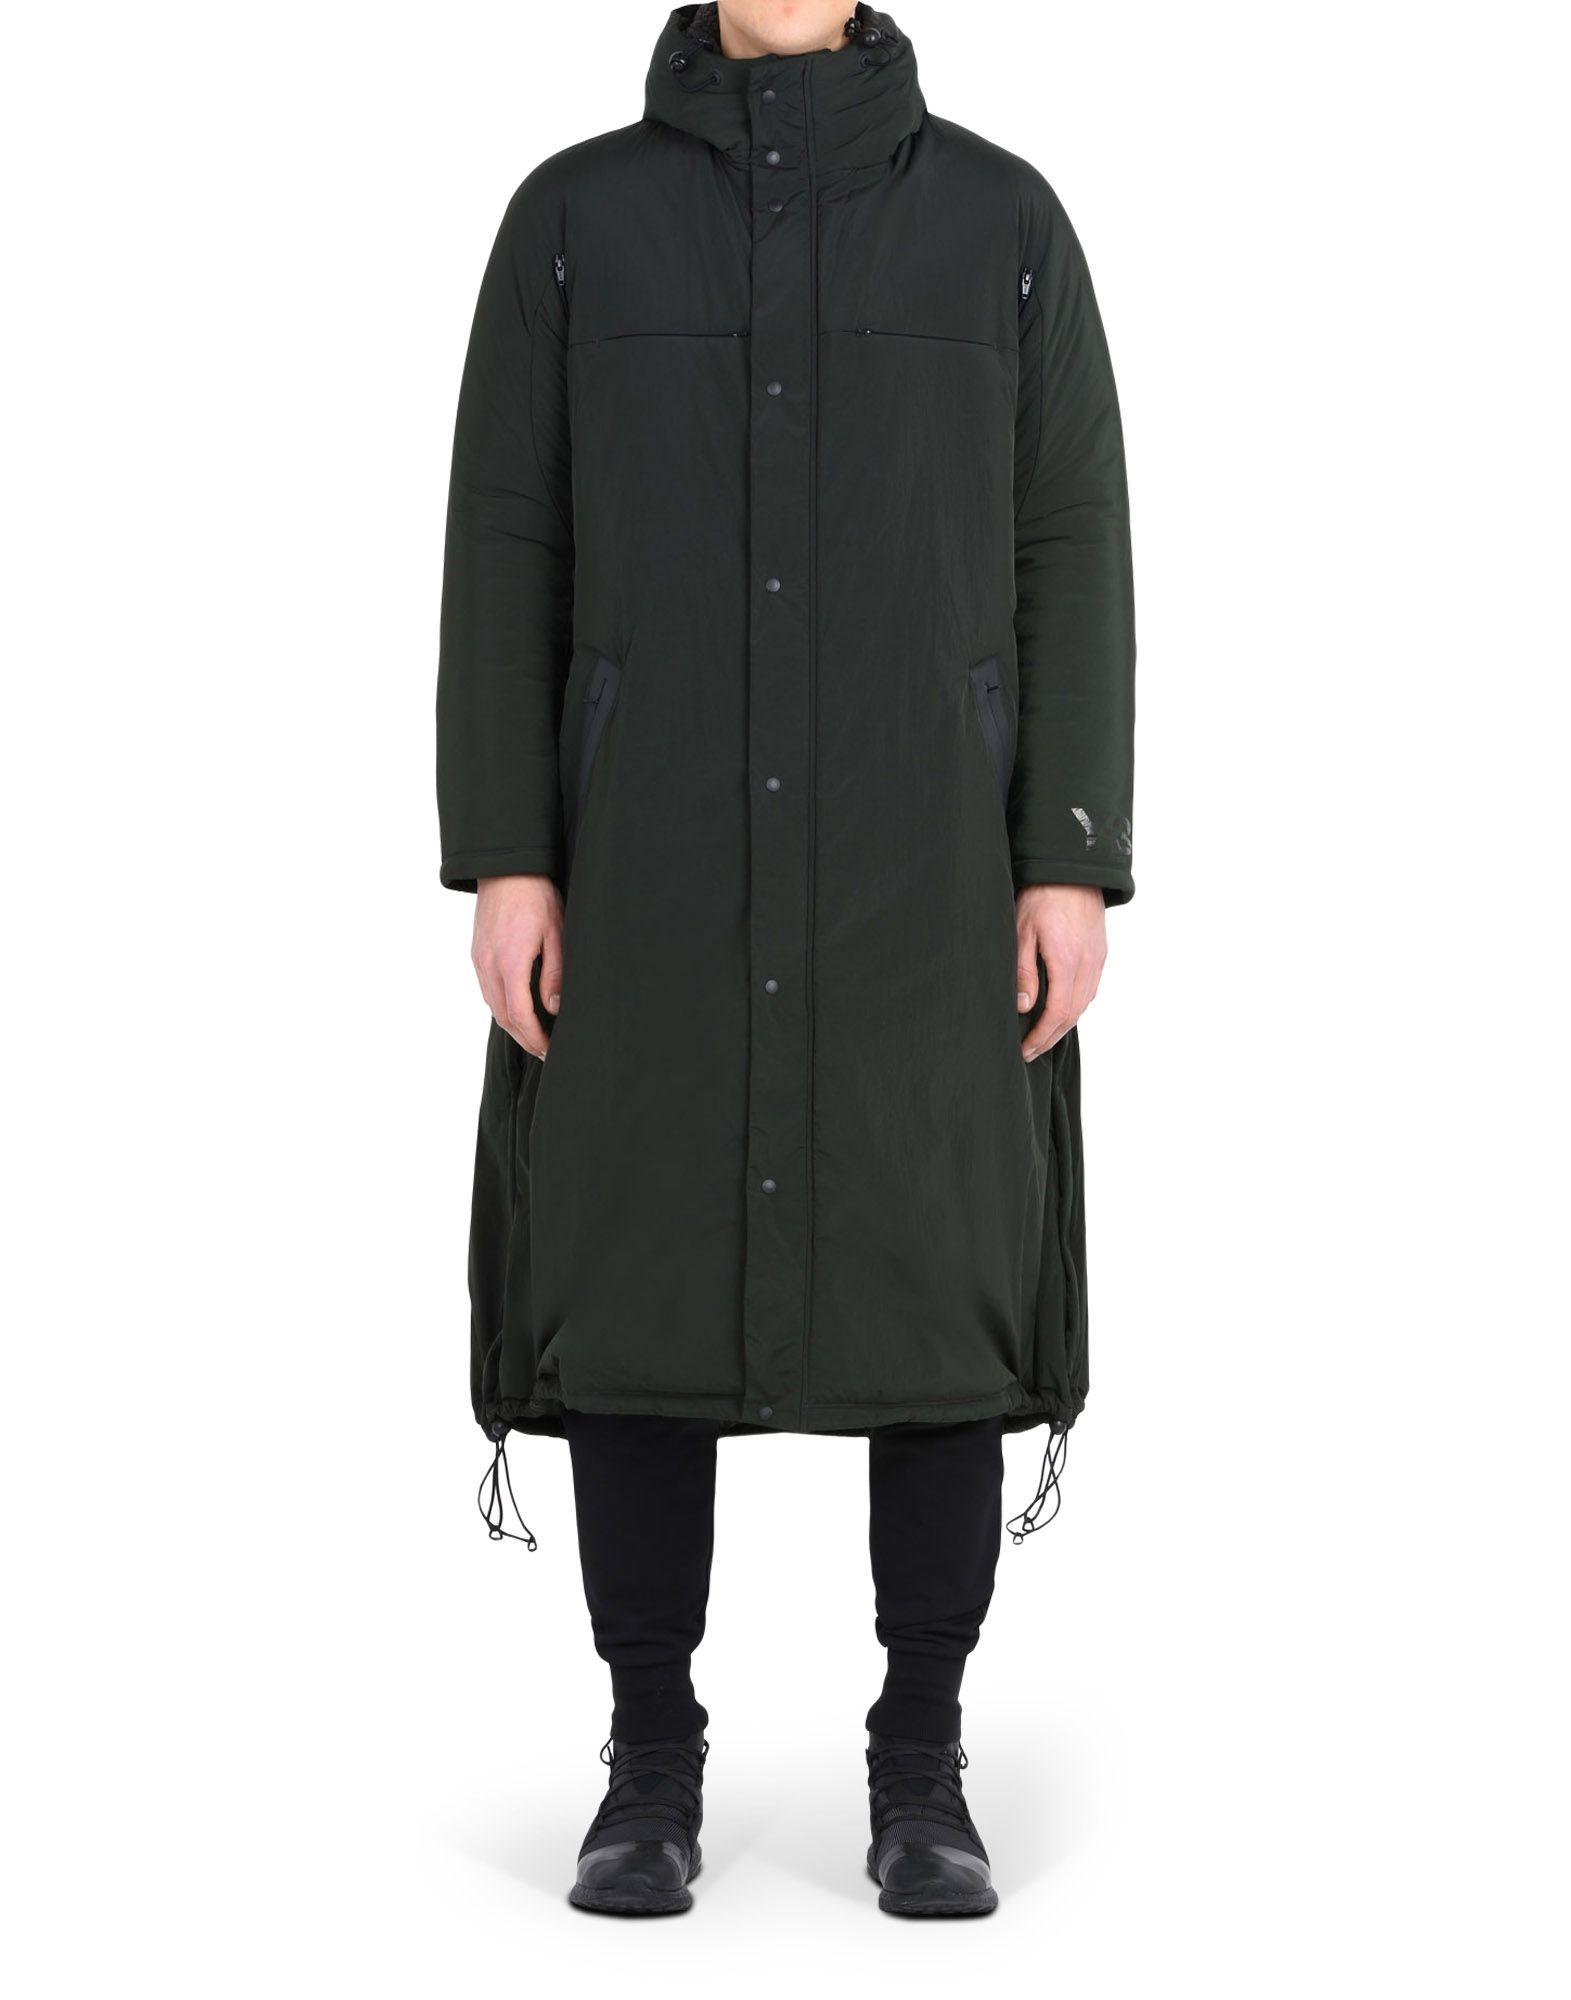 Y-3 Y-3 PADDED COAT Coat Man r